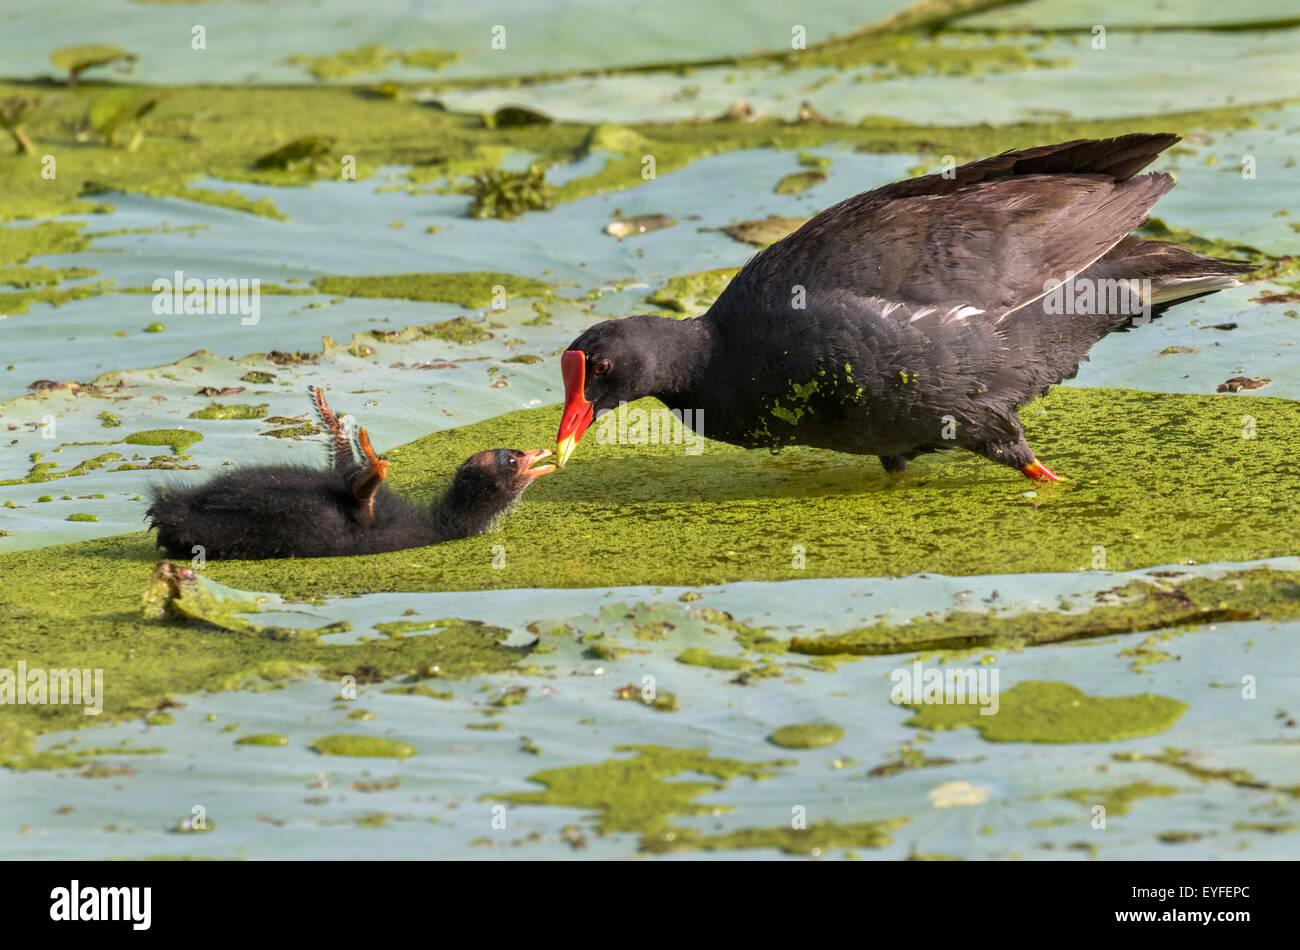 (Gallinula galeata gallinule commune) nourrir un poussin, Brazos Bend State Park, Needville, Texas, USA. Photo Stock